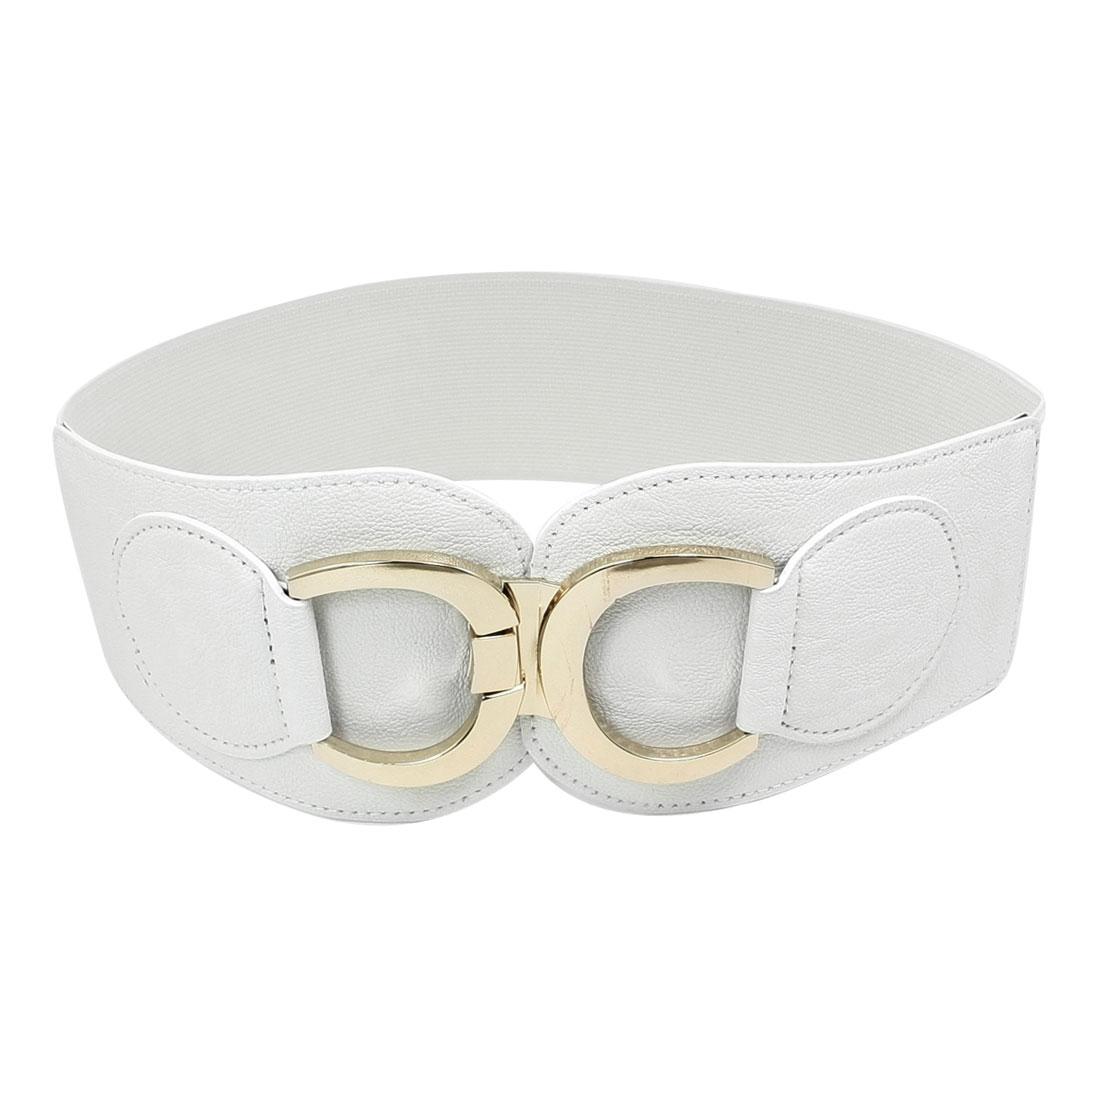 Fashionable C Shape Interlocking Buckle Spandex Waistbelt White for Women Ladies